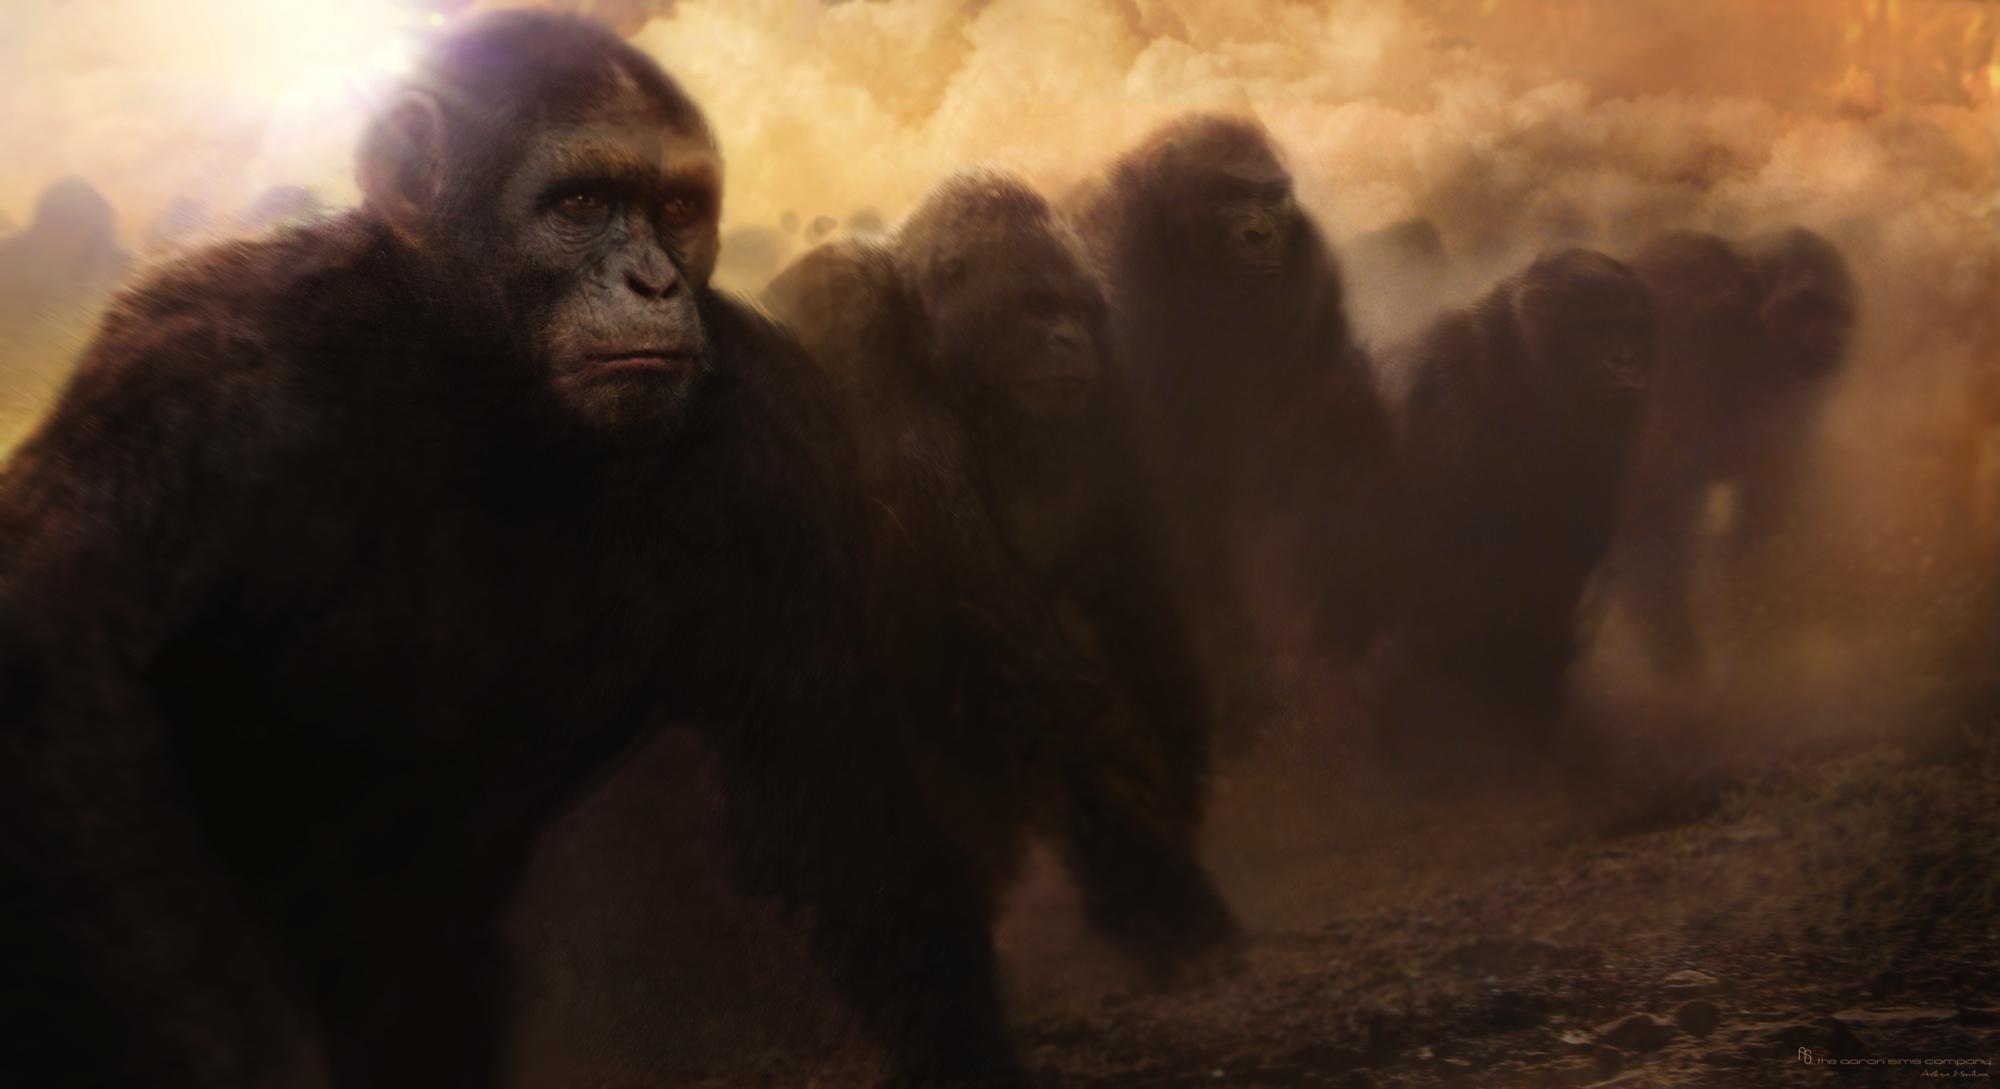 La Rebelion del Planeta de los Simios